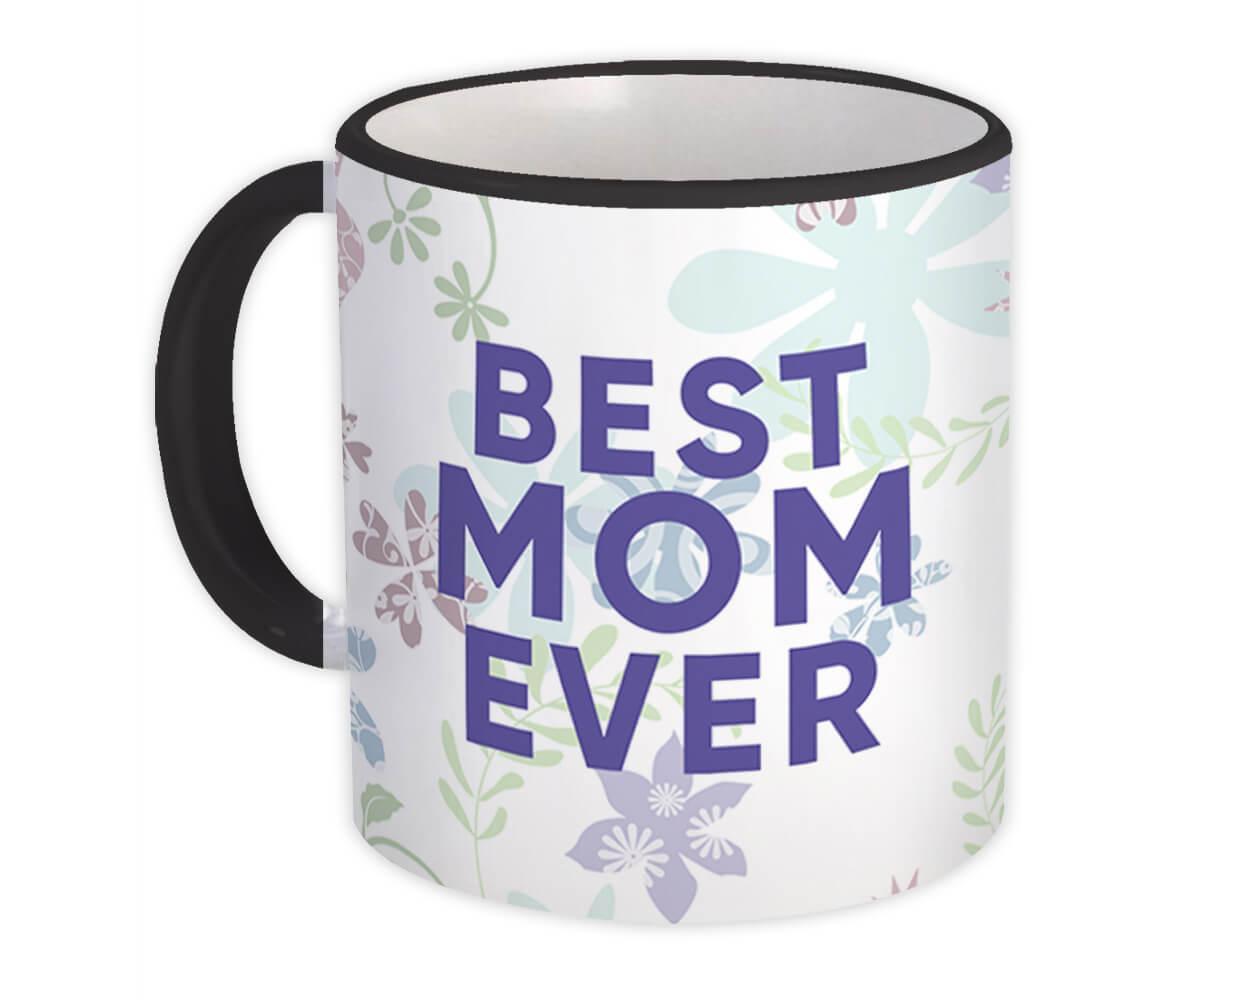 Best MOM Ever : Gift Mug Mother Day Floral Flower Birthday Christmas